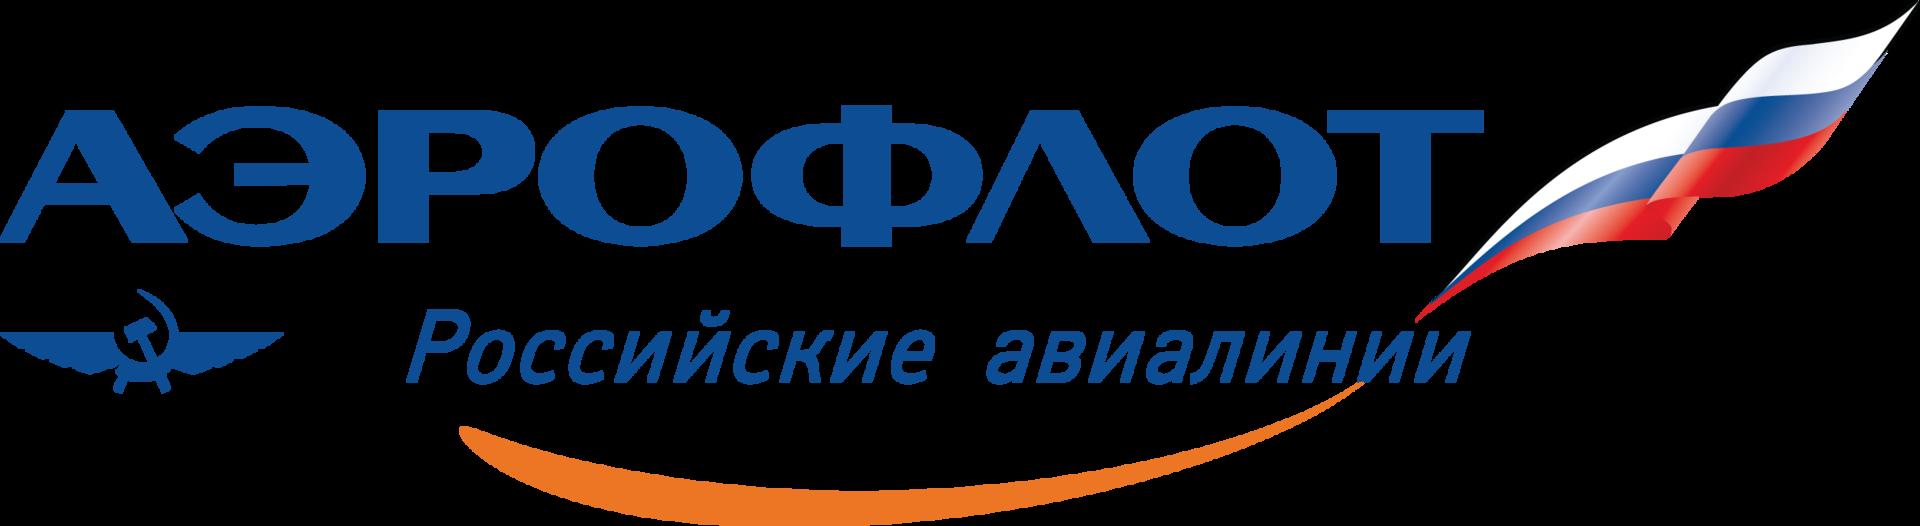 Ошибки в настройке SPF, в домене aeroflot.ru - 1